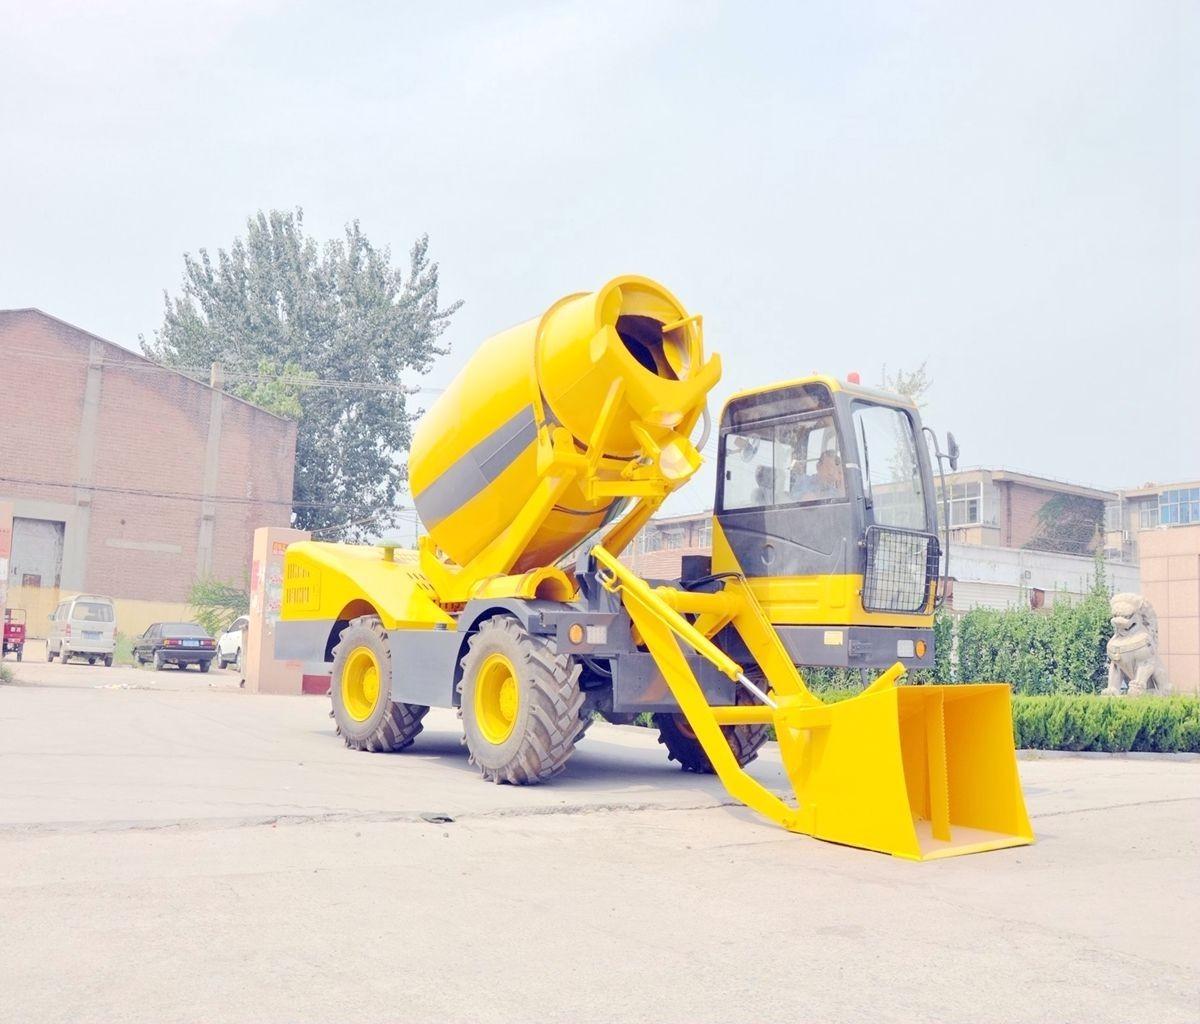 Sales Self-loading Concrete Mixer Truck Machine China, Buy Self-loading Concrete Mixer Truck Machine China, Self-loading Concrete Mixer Truck Machine China Factory, Self-loading Concrete Mixer Truck Machine China Brands